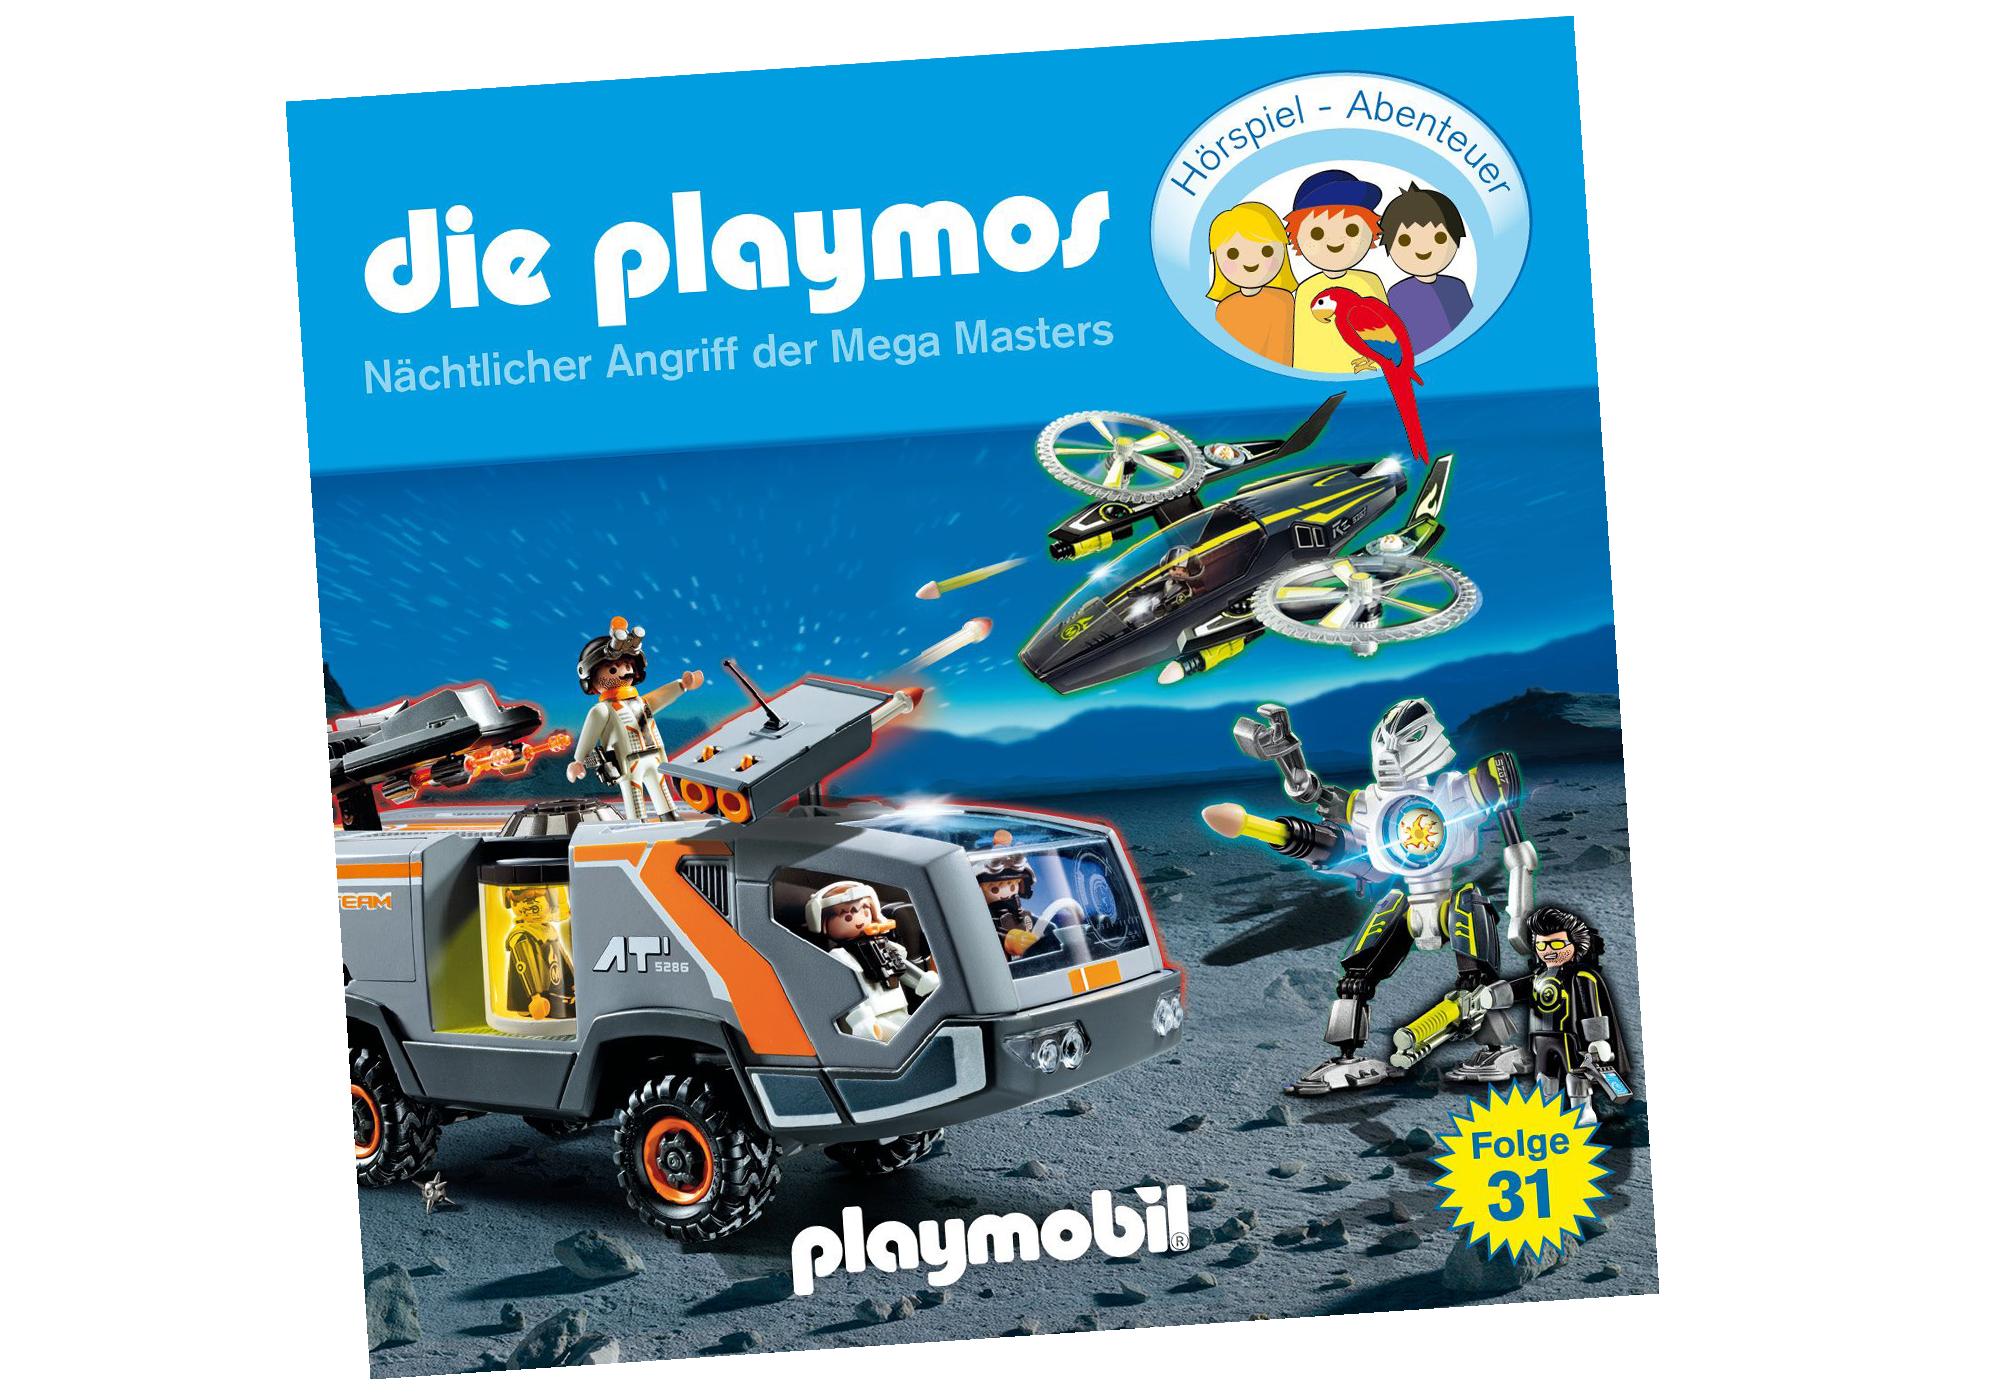 http://media.playmobil.com/i/playmobil/80350_product_detail/Nächtlicher Angriff der Mega Masters (31) - CD